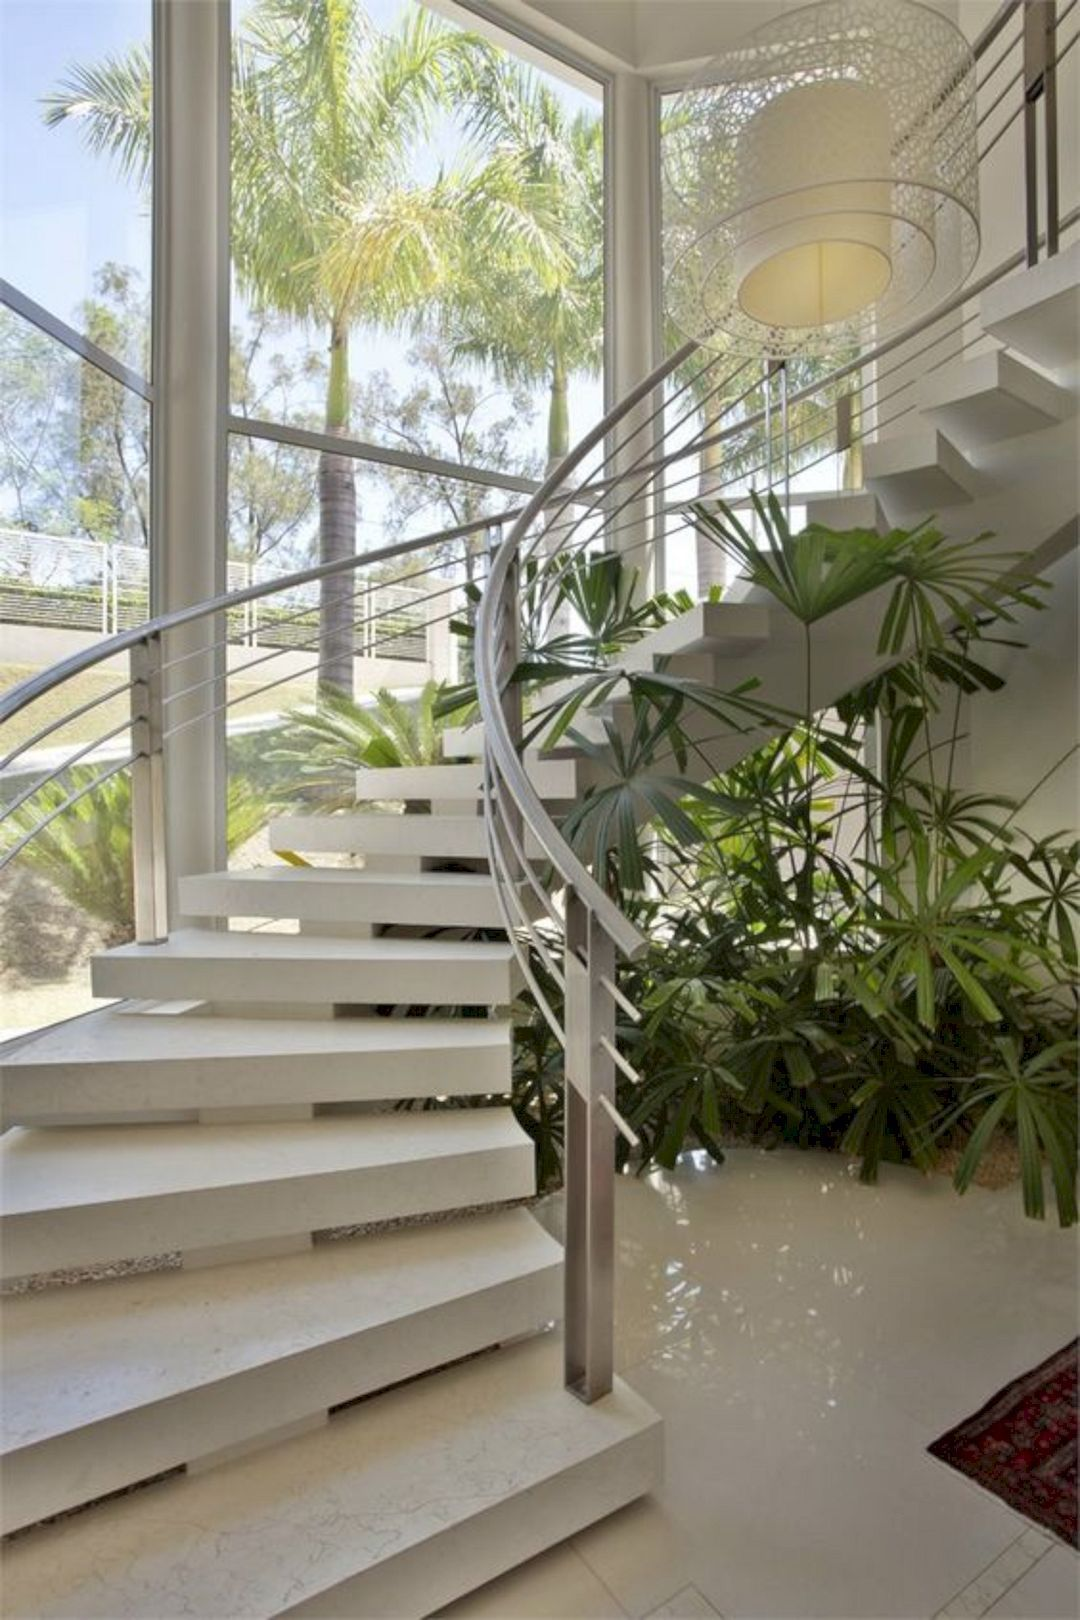 15 Interior Design Ideas to Revamp Your Stairway